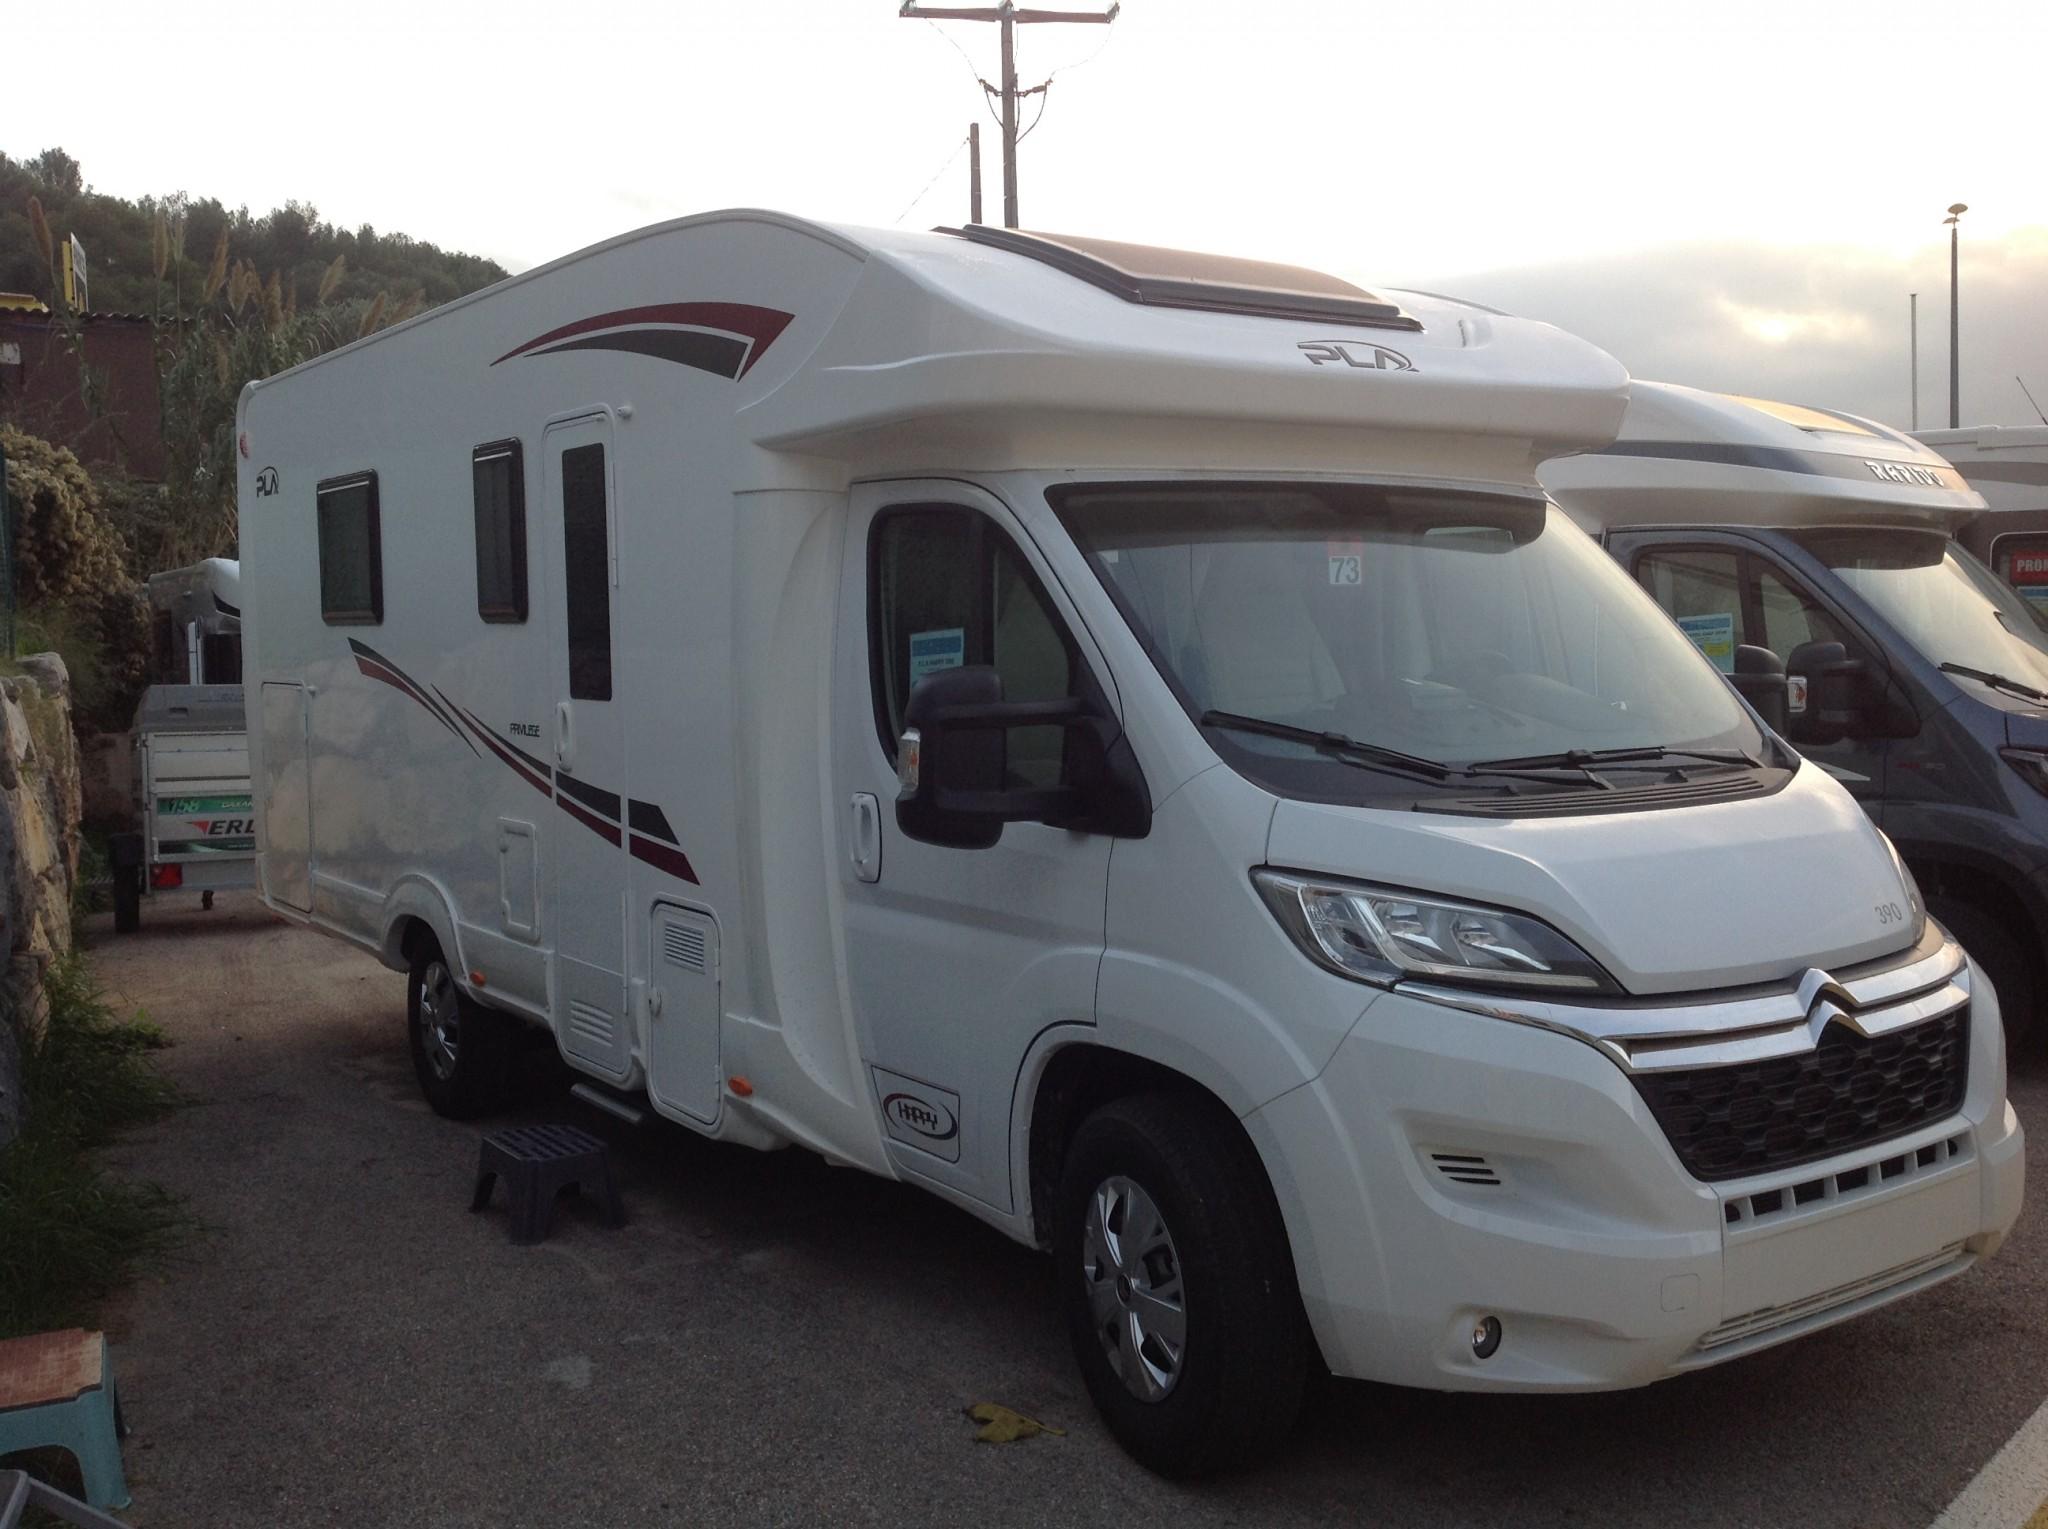 pla camper happy 390 neuf de 2019 fiat camping car en. Black Bedroom Furniture Sets. Home Design Ideas